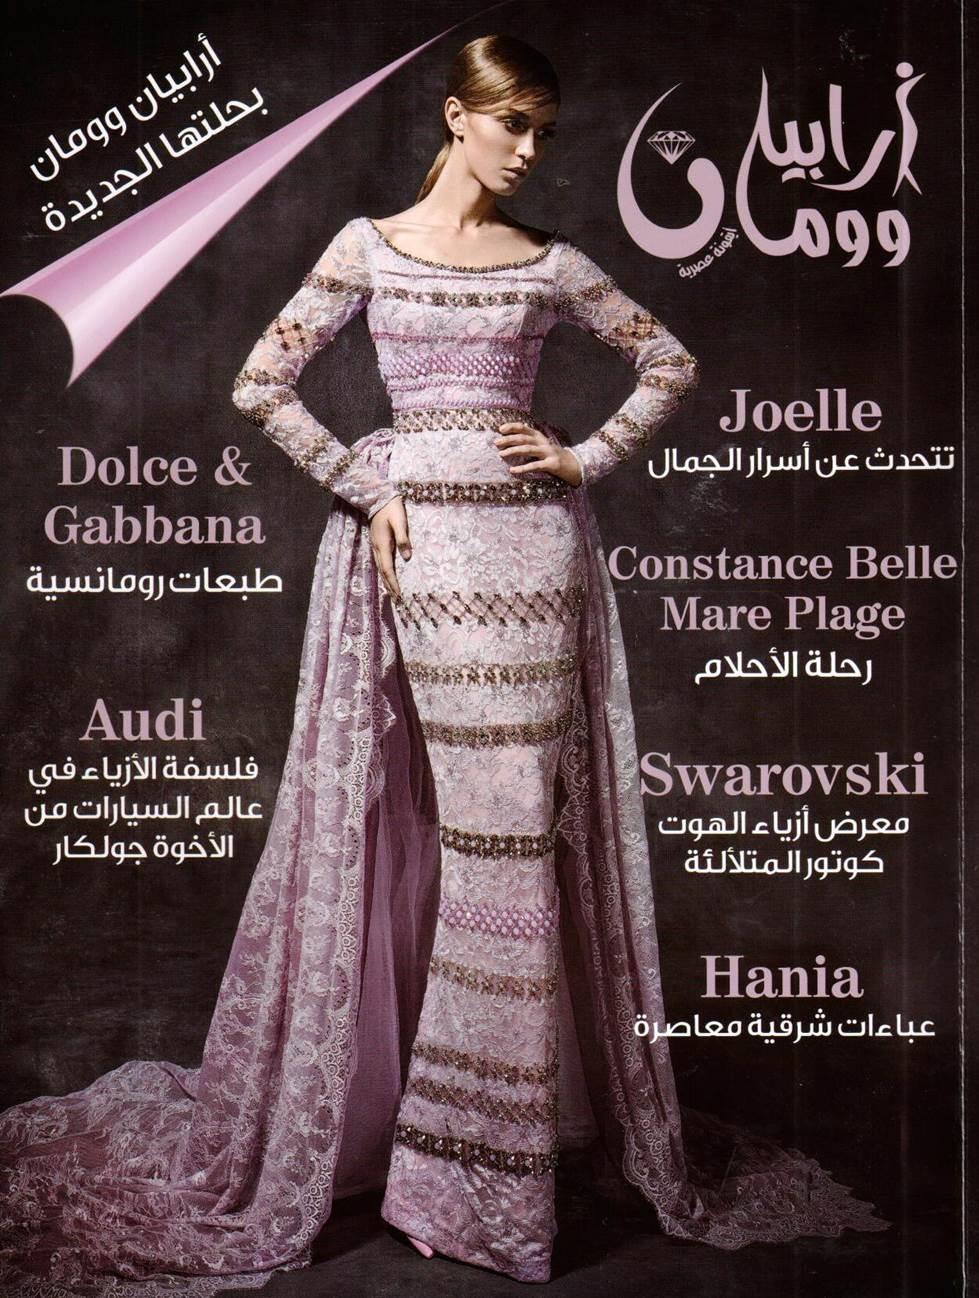 ARabian Woman cover.jpg